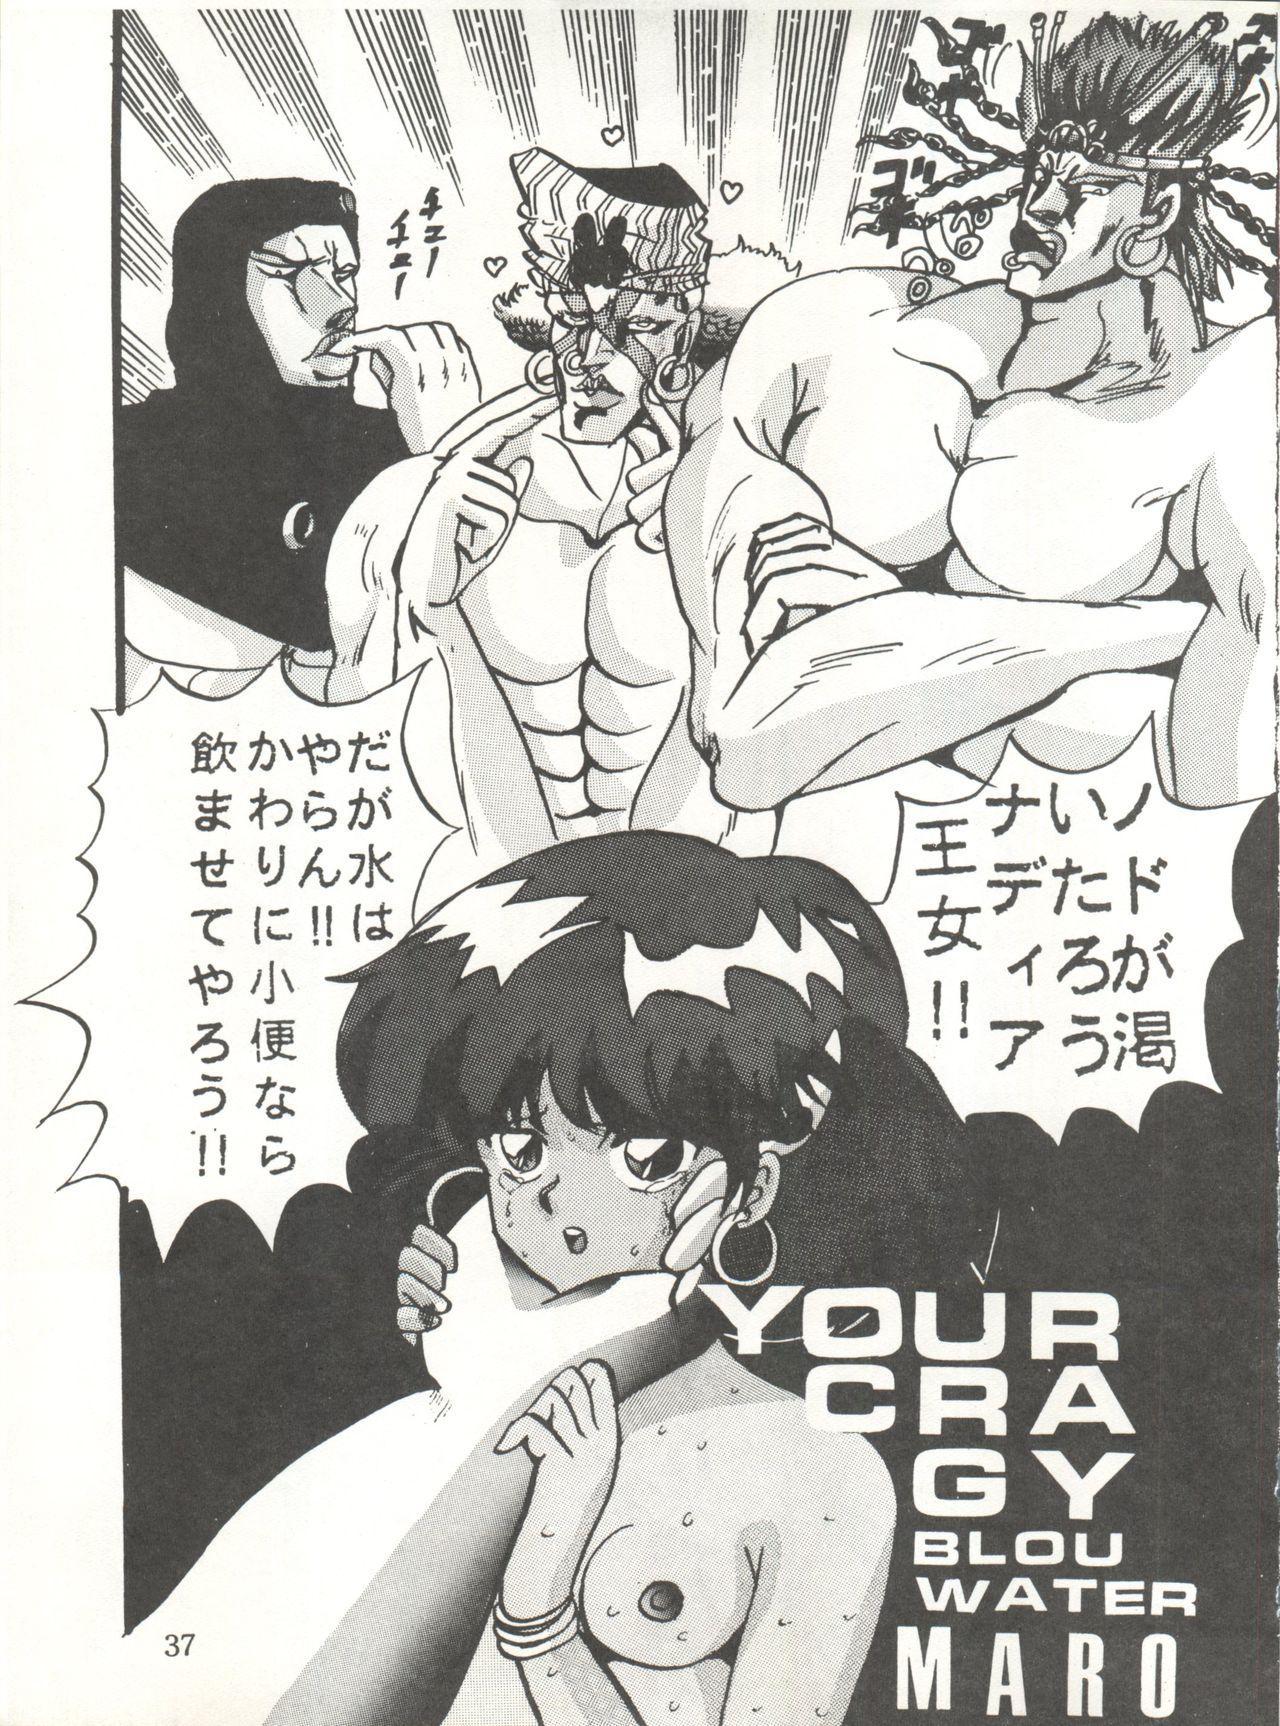 [Global One (MARO)] Sadistic 5 (Cutey Honey, Devilman, Sailor Moon), [Global One (MARO)] Sadistic (Dirty Pair, Fushigi no Umi no Nadia, Sailor Moon), [Studio Ikkatsumajin] .ribbon (Hime-chan's Ribbon) 96